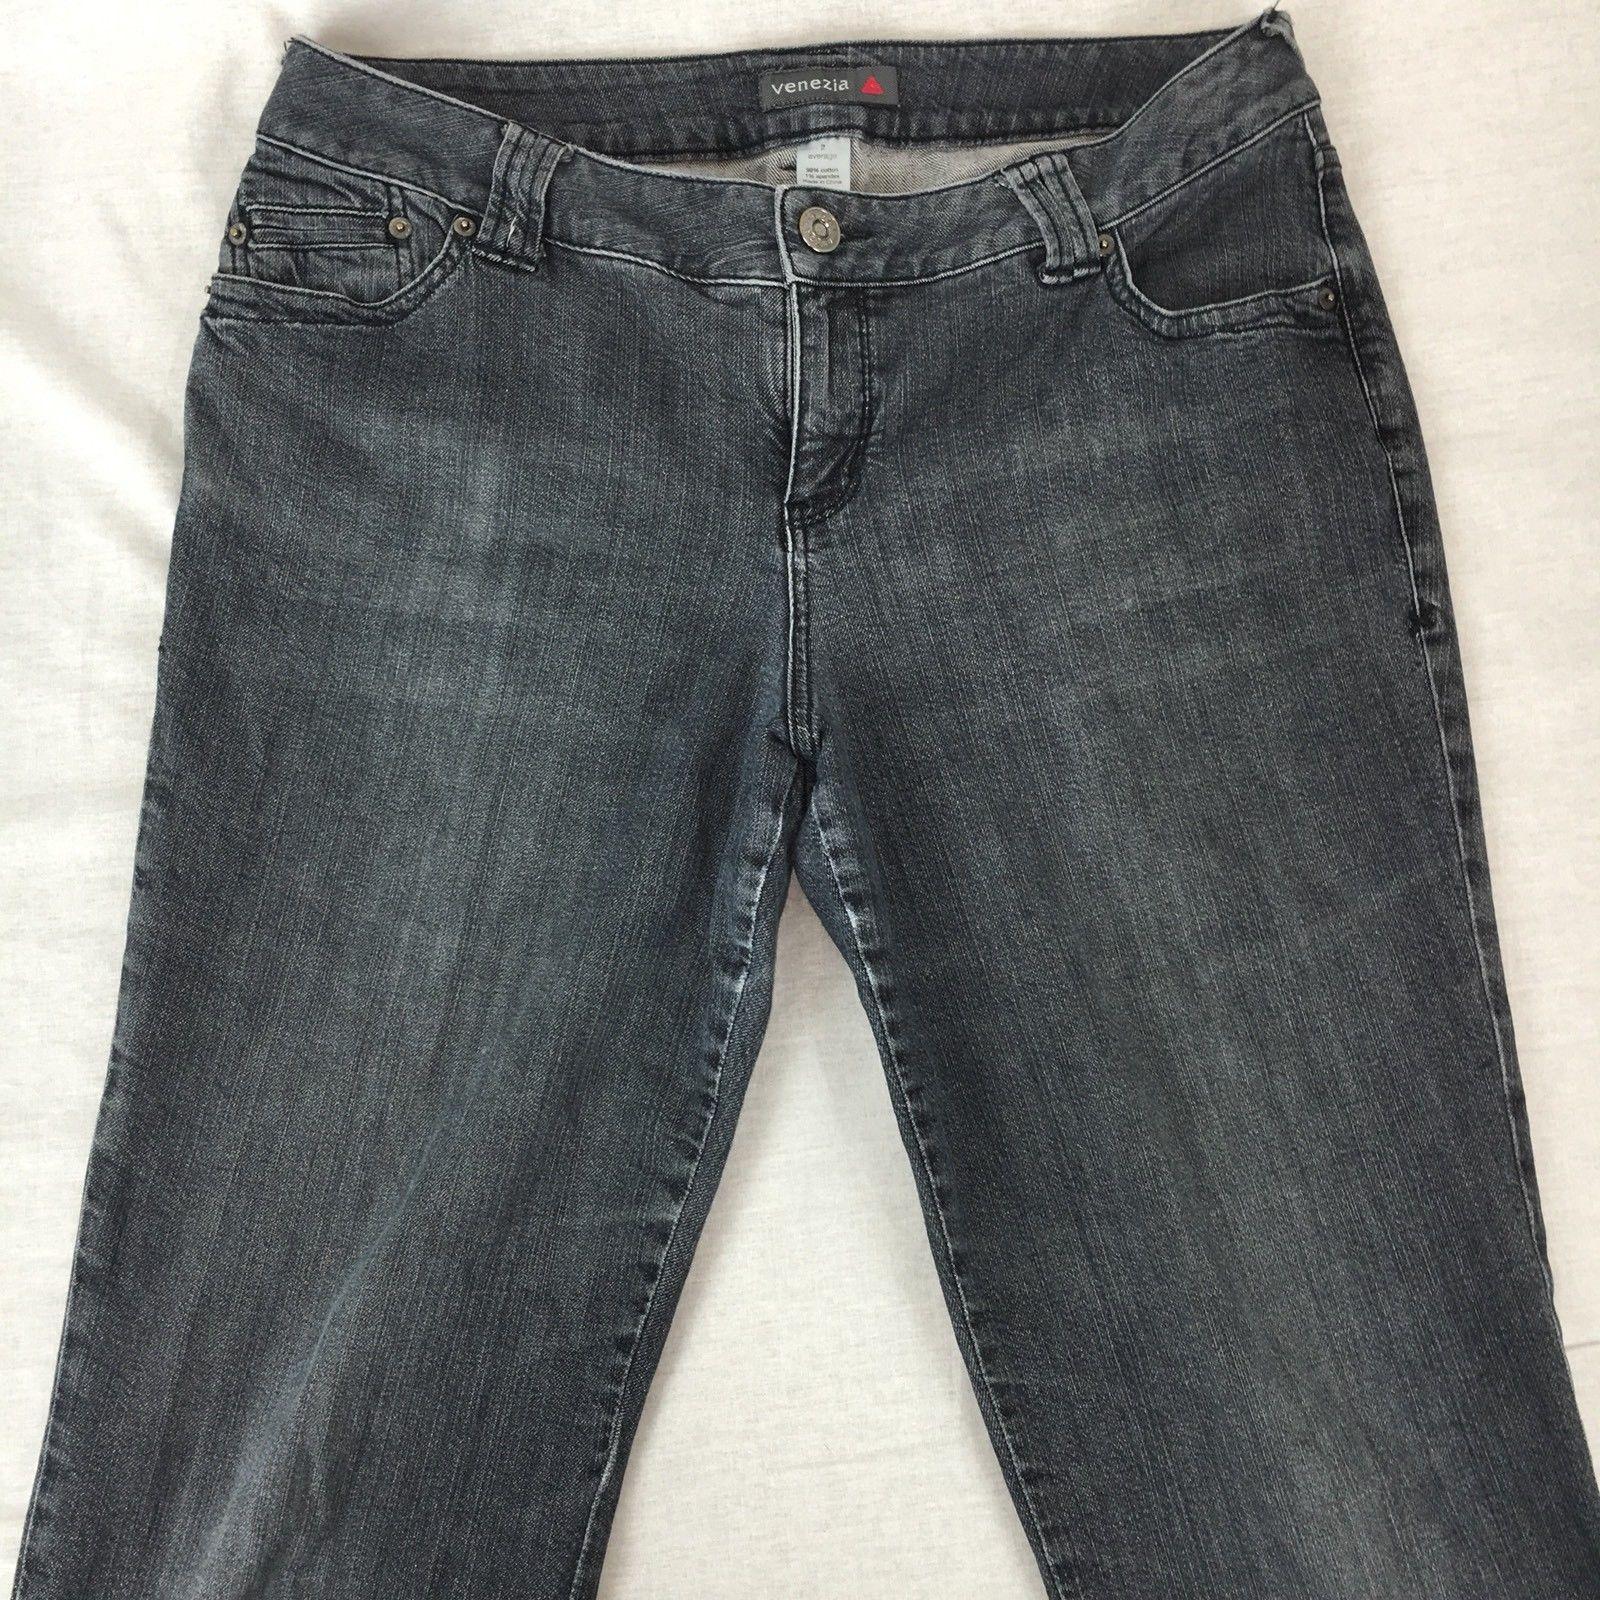 Venezia Lane Bryant Jeans Straight Leg Cotton Stretch Faded Black Plus Size 2